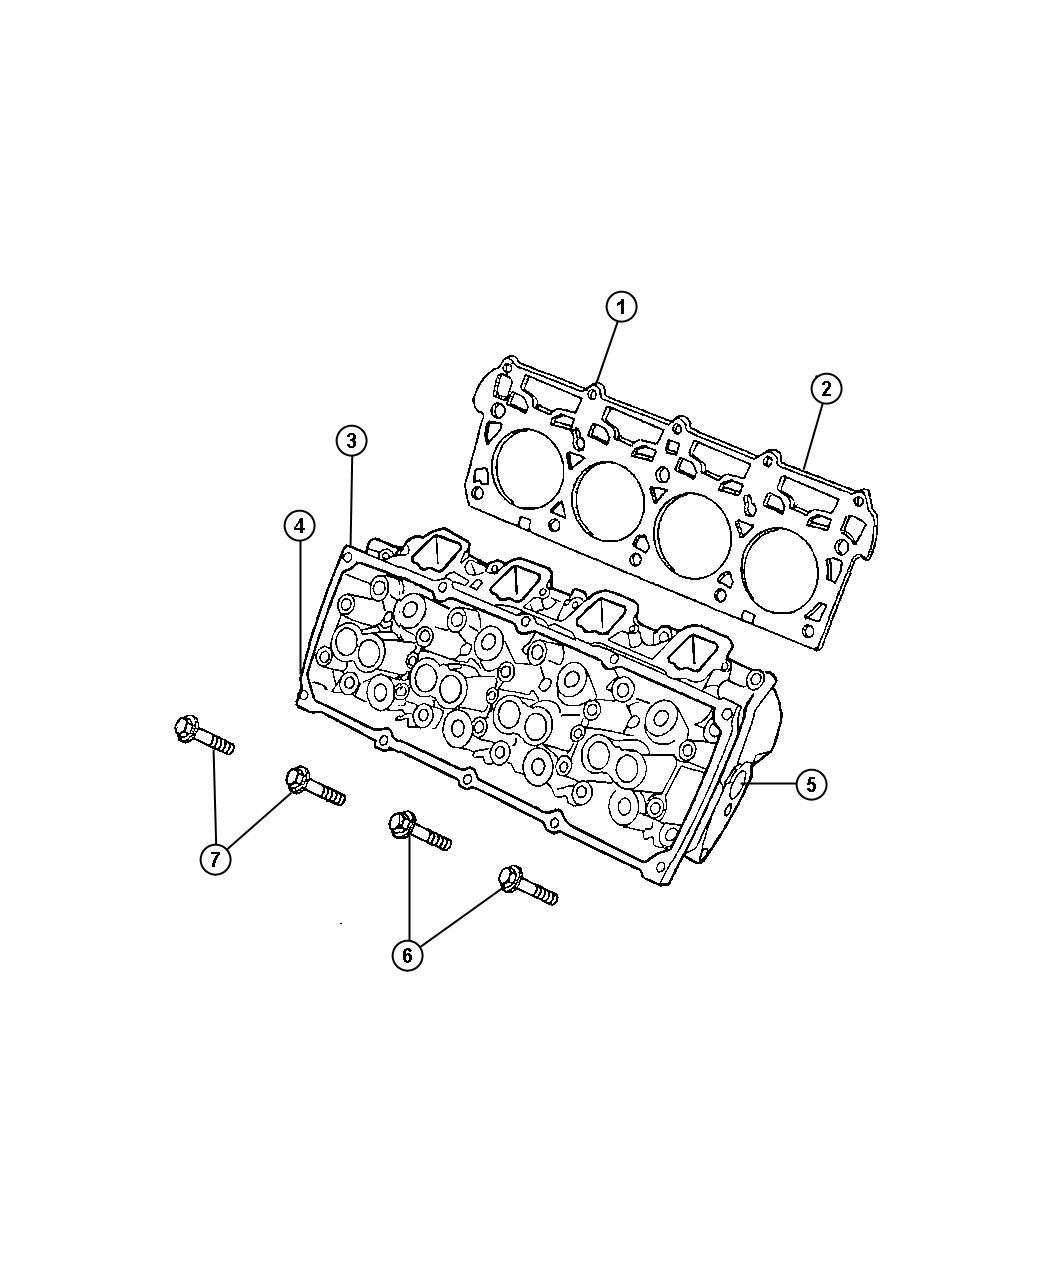 Dodge Ram Head Engine Cylinder With Valves